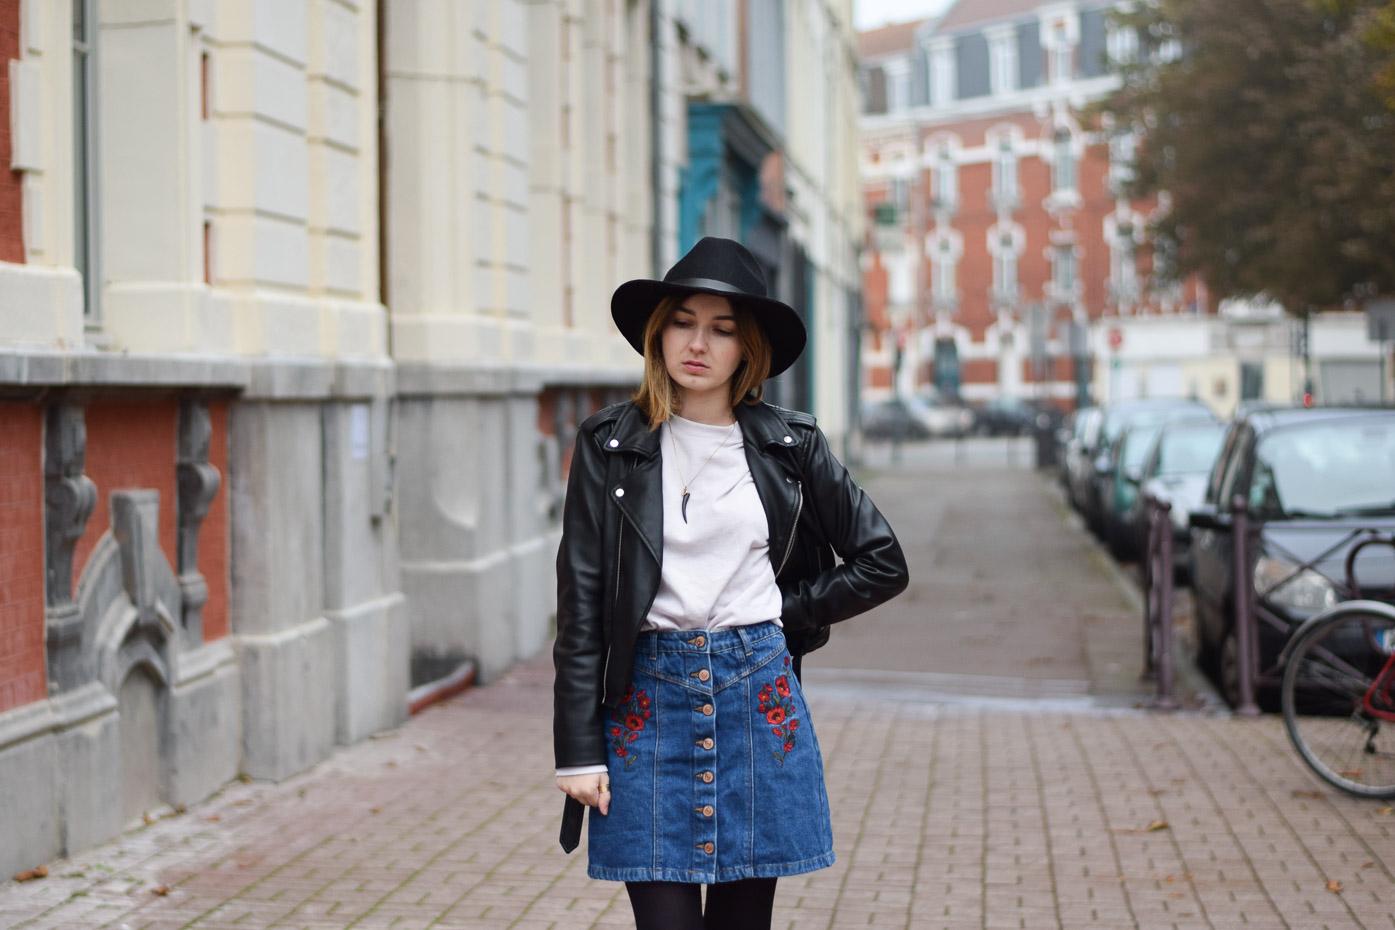 perfecto zara panama h&m outfit look fall